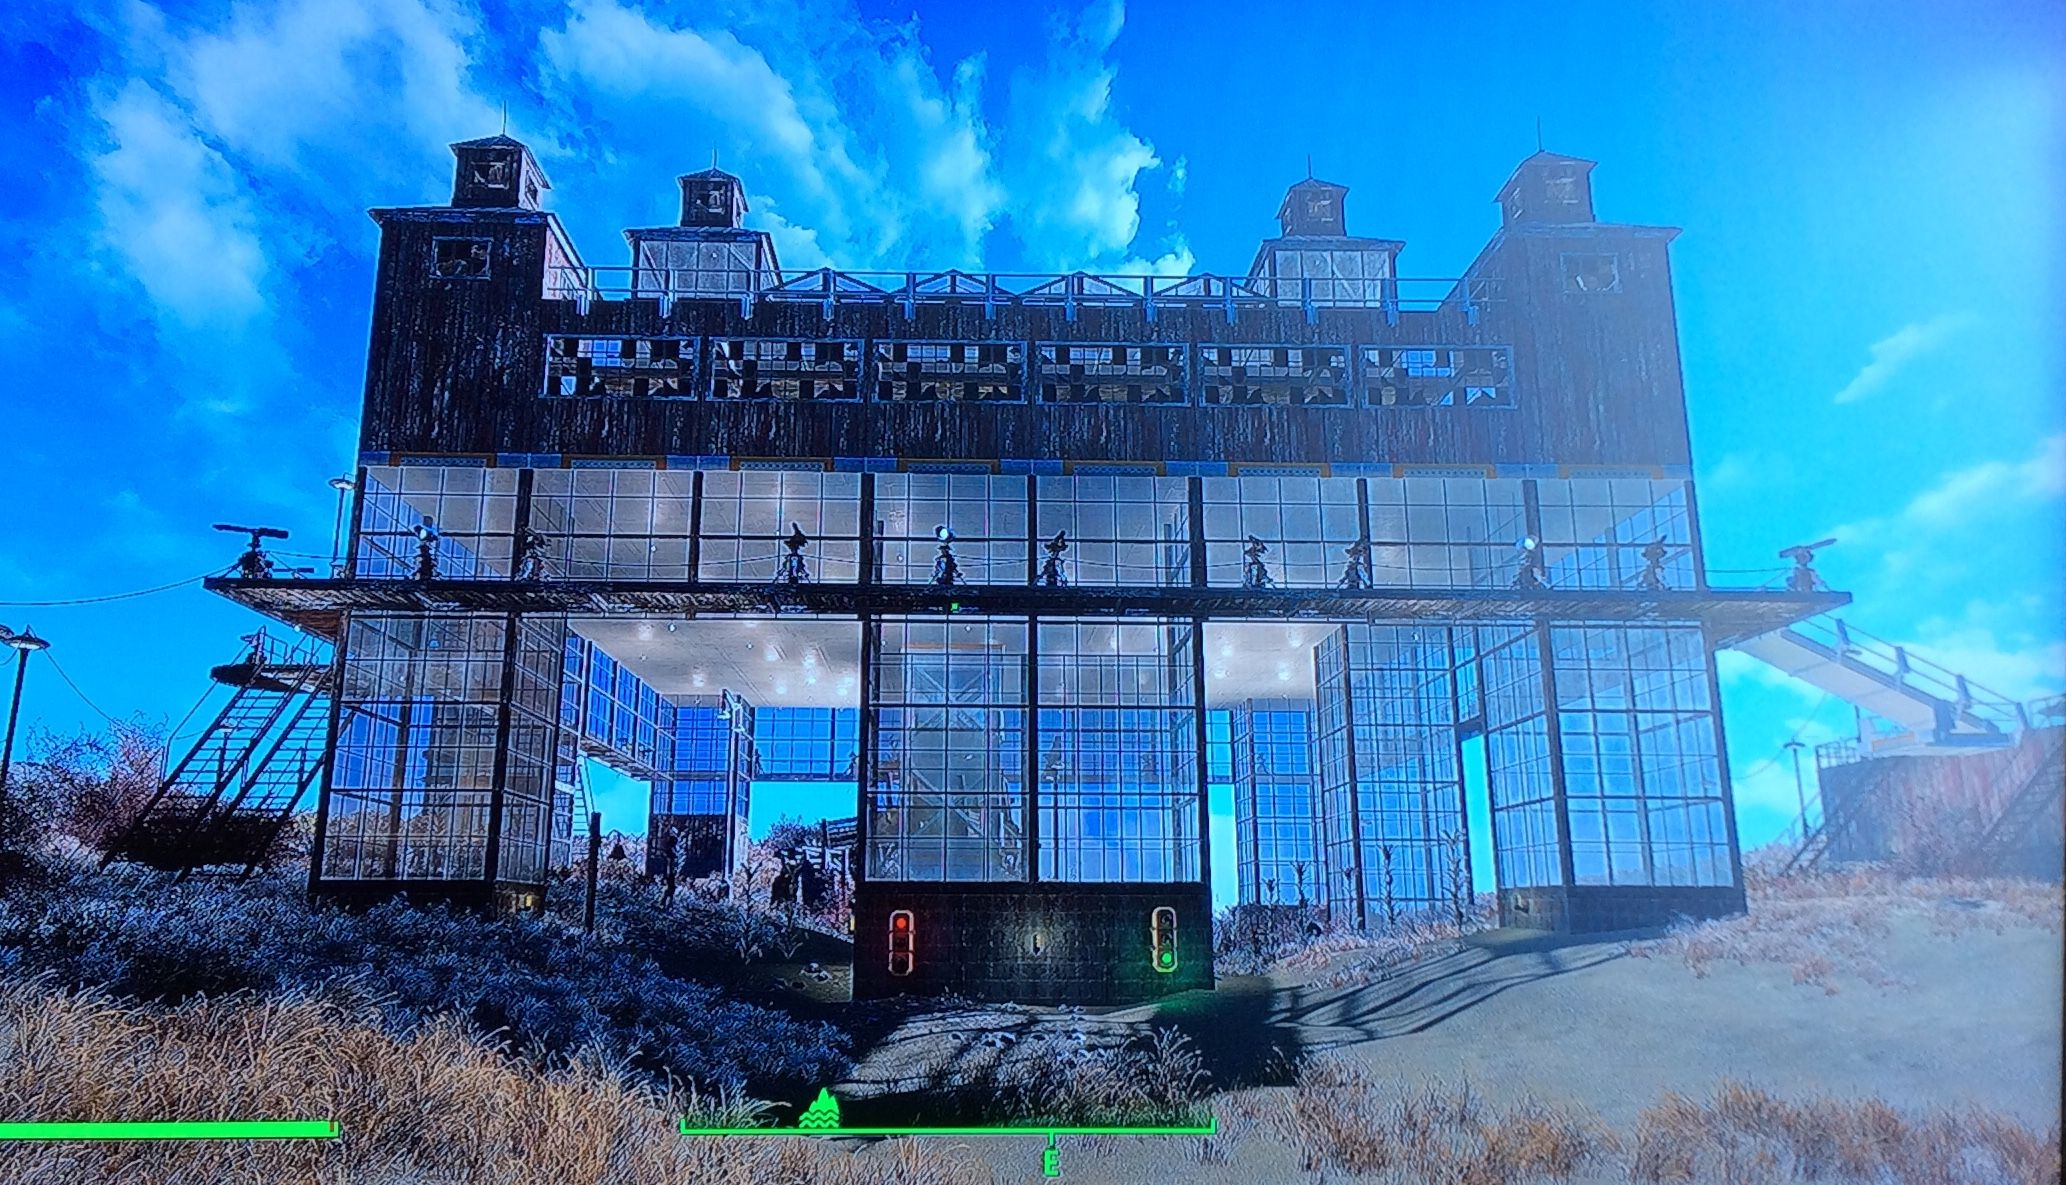 Fallout 4 Spectacle Island Fallout settlement, Fallout 4